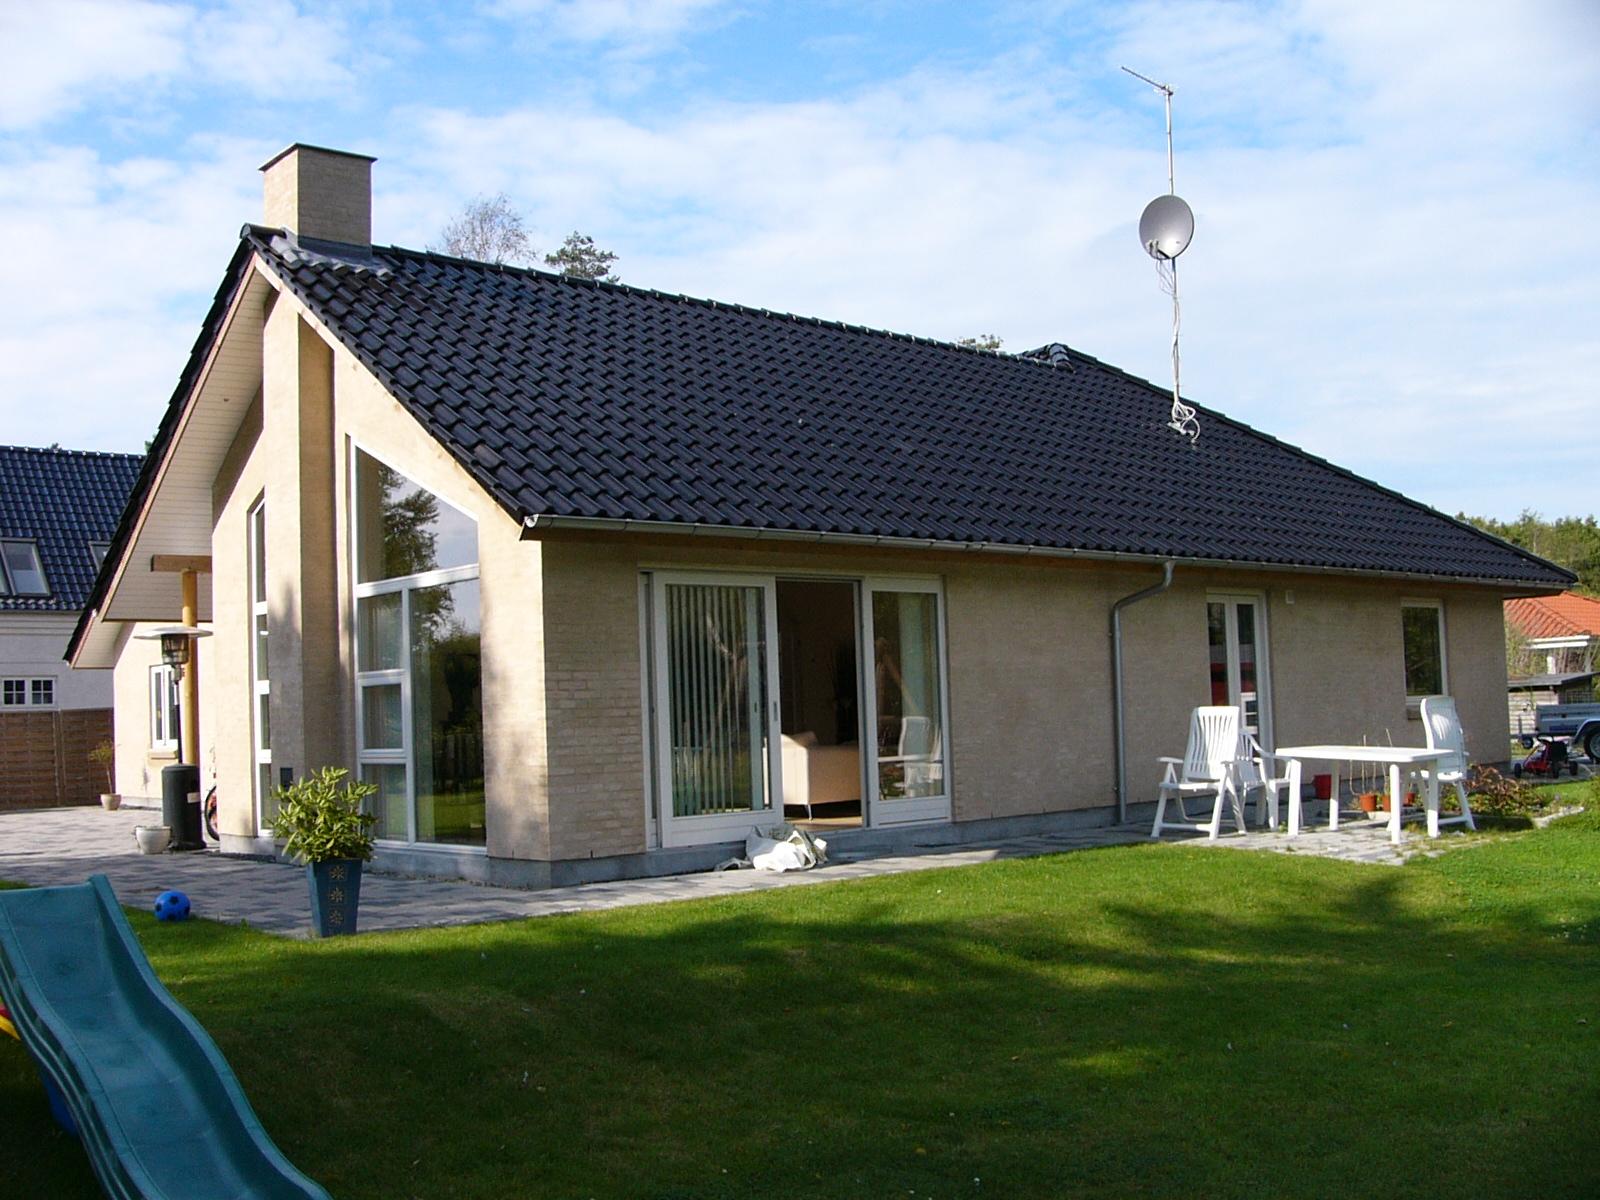 1-plans villa med atrium | Arkitektfirmaet Jacob Jensen